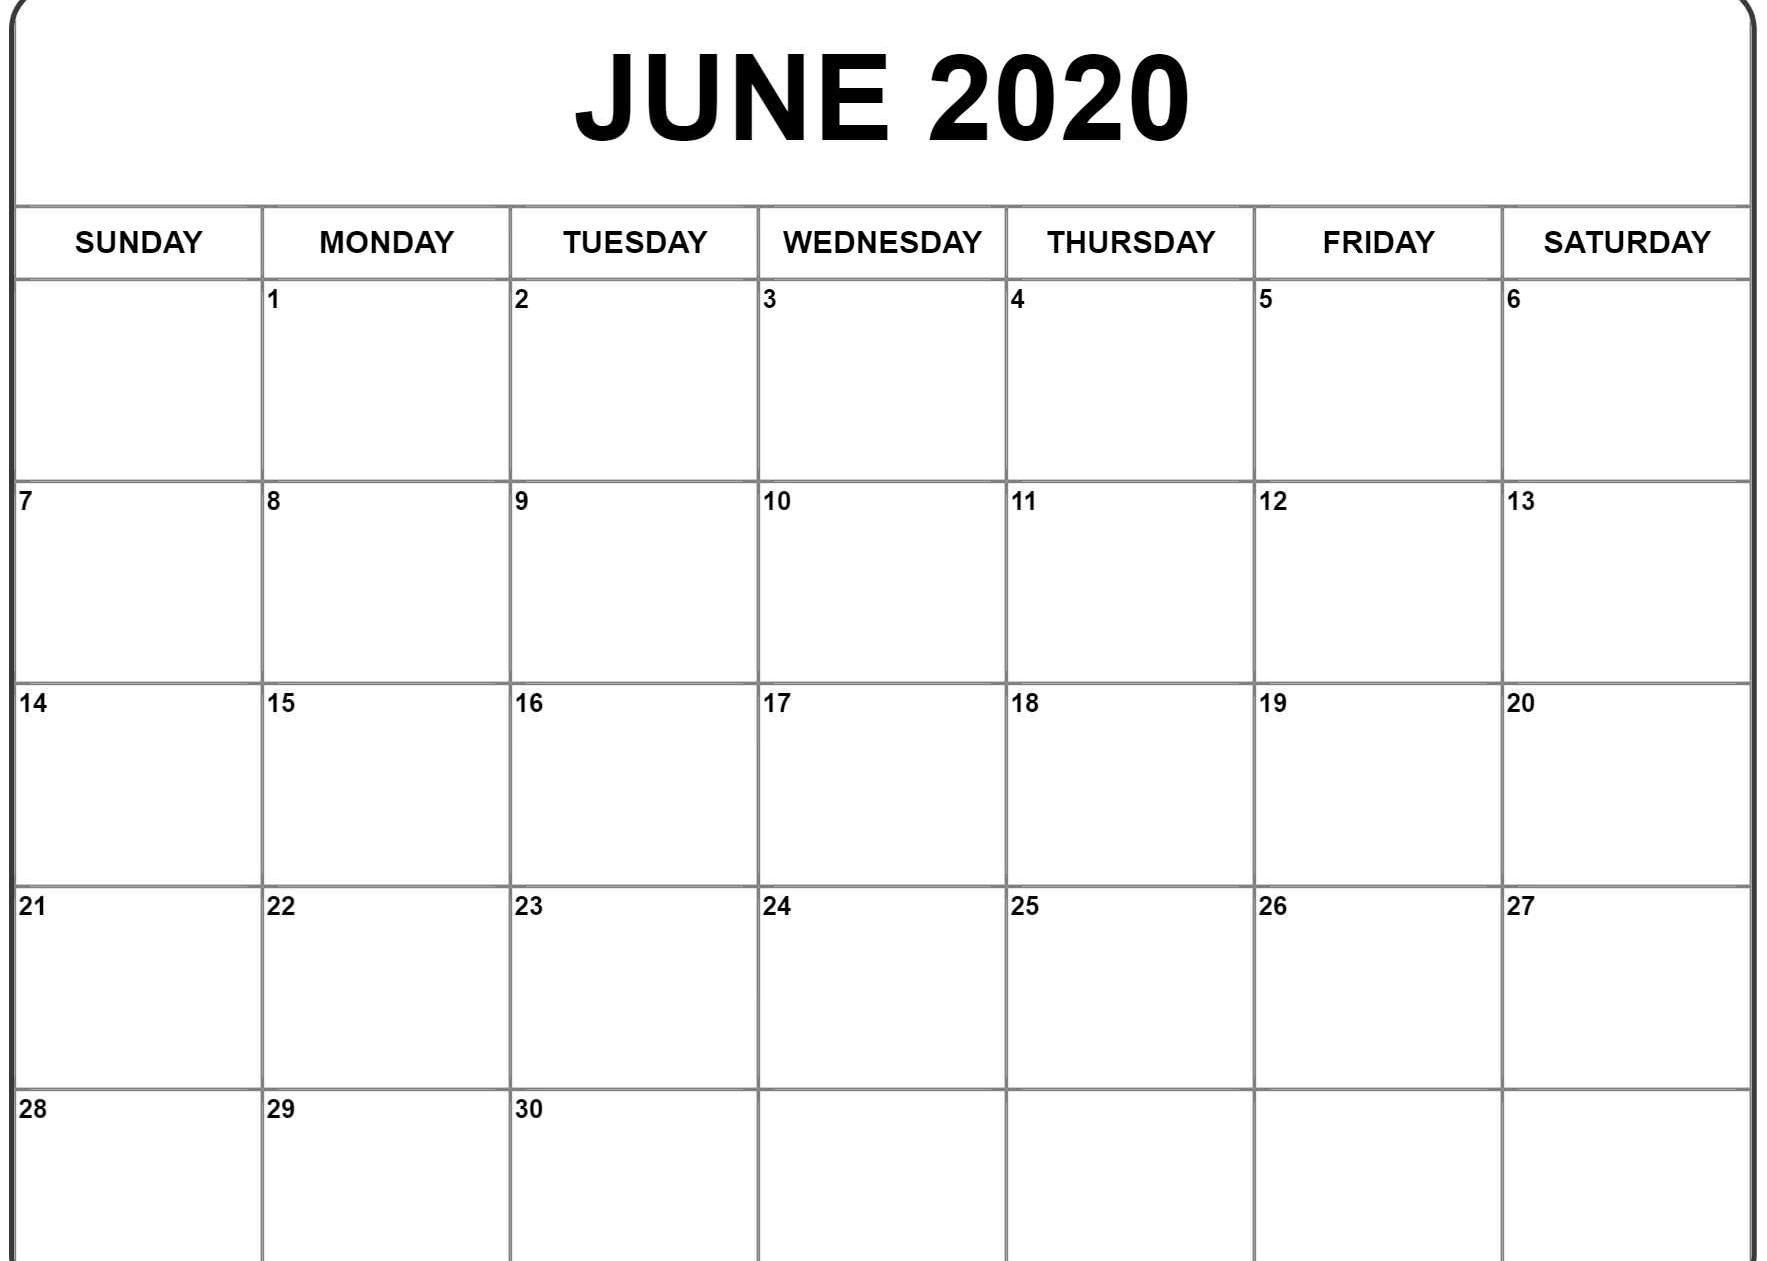 June 2020 Calendar | Printable Calendar Template, Monthly for 2020 Monday Through Sunday Calendar Template